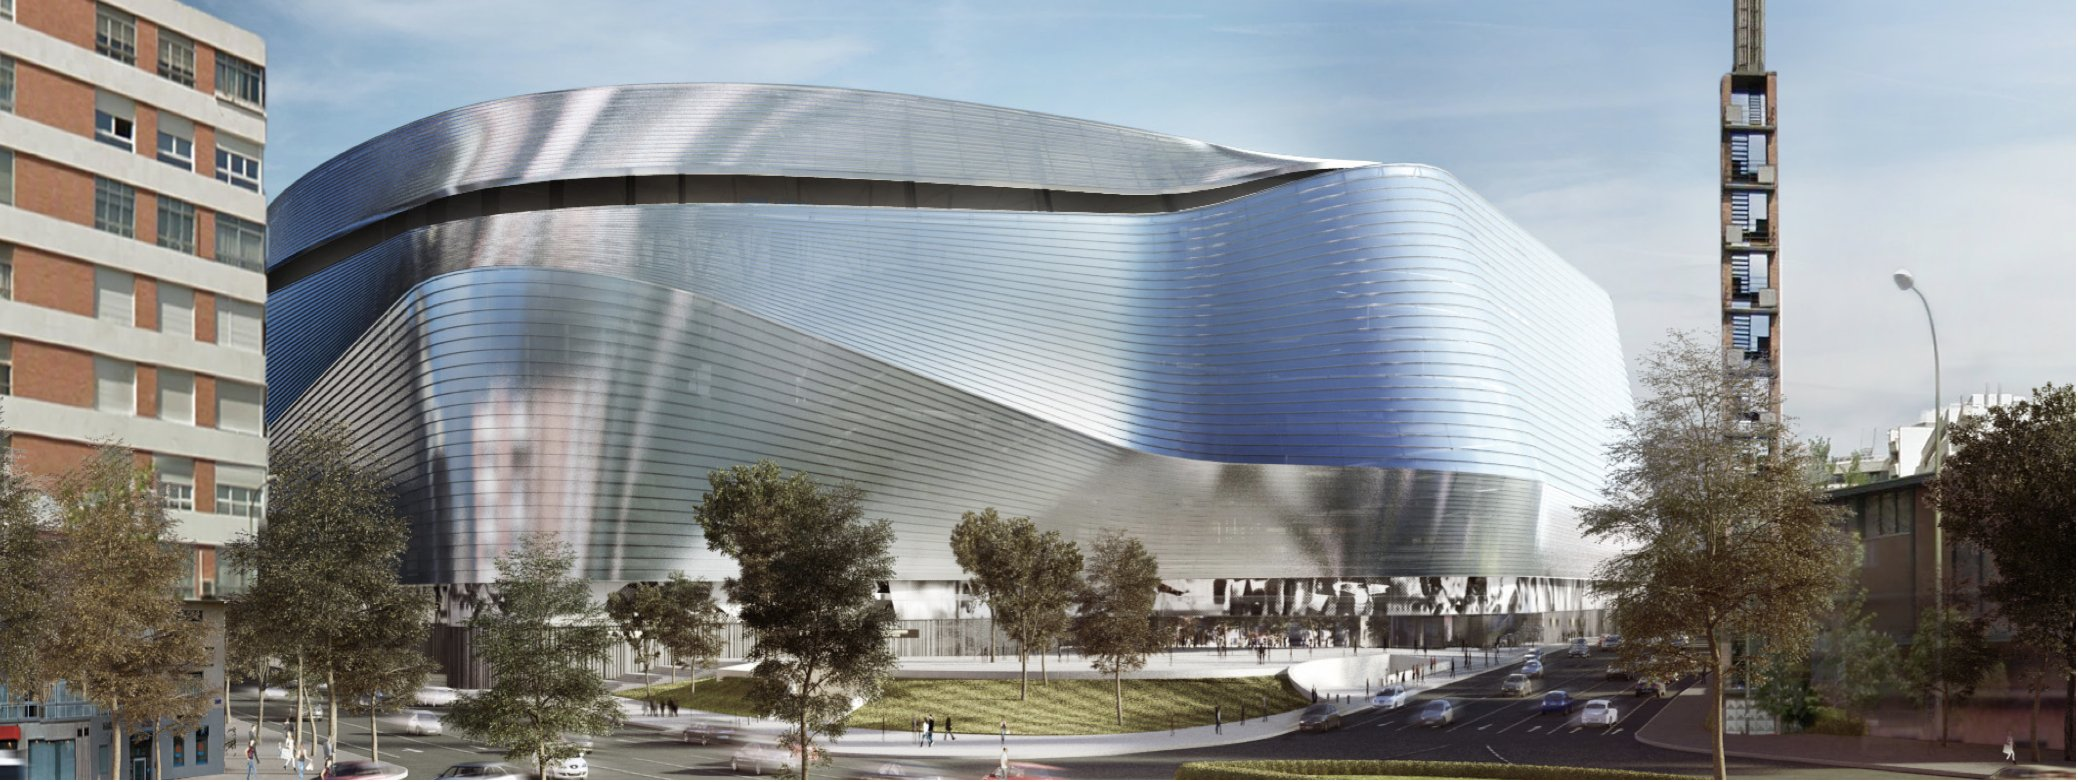 Projekt estadio santiago bernab u for Puerta 53 santiago bernabeu